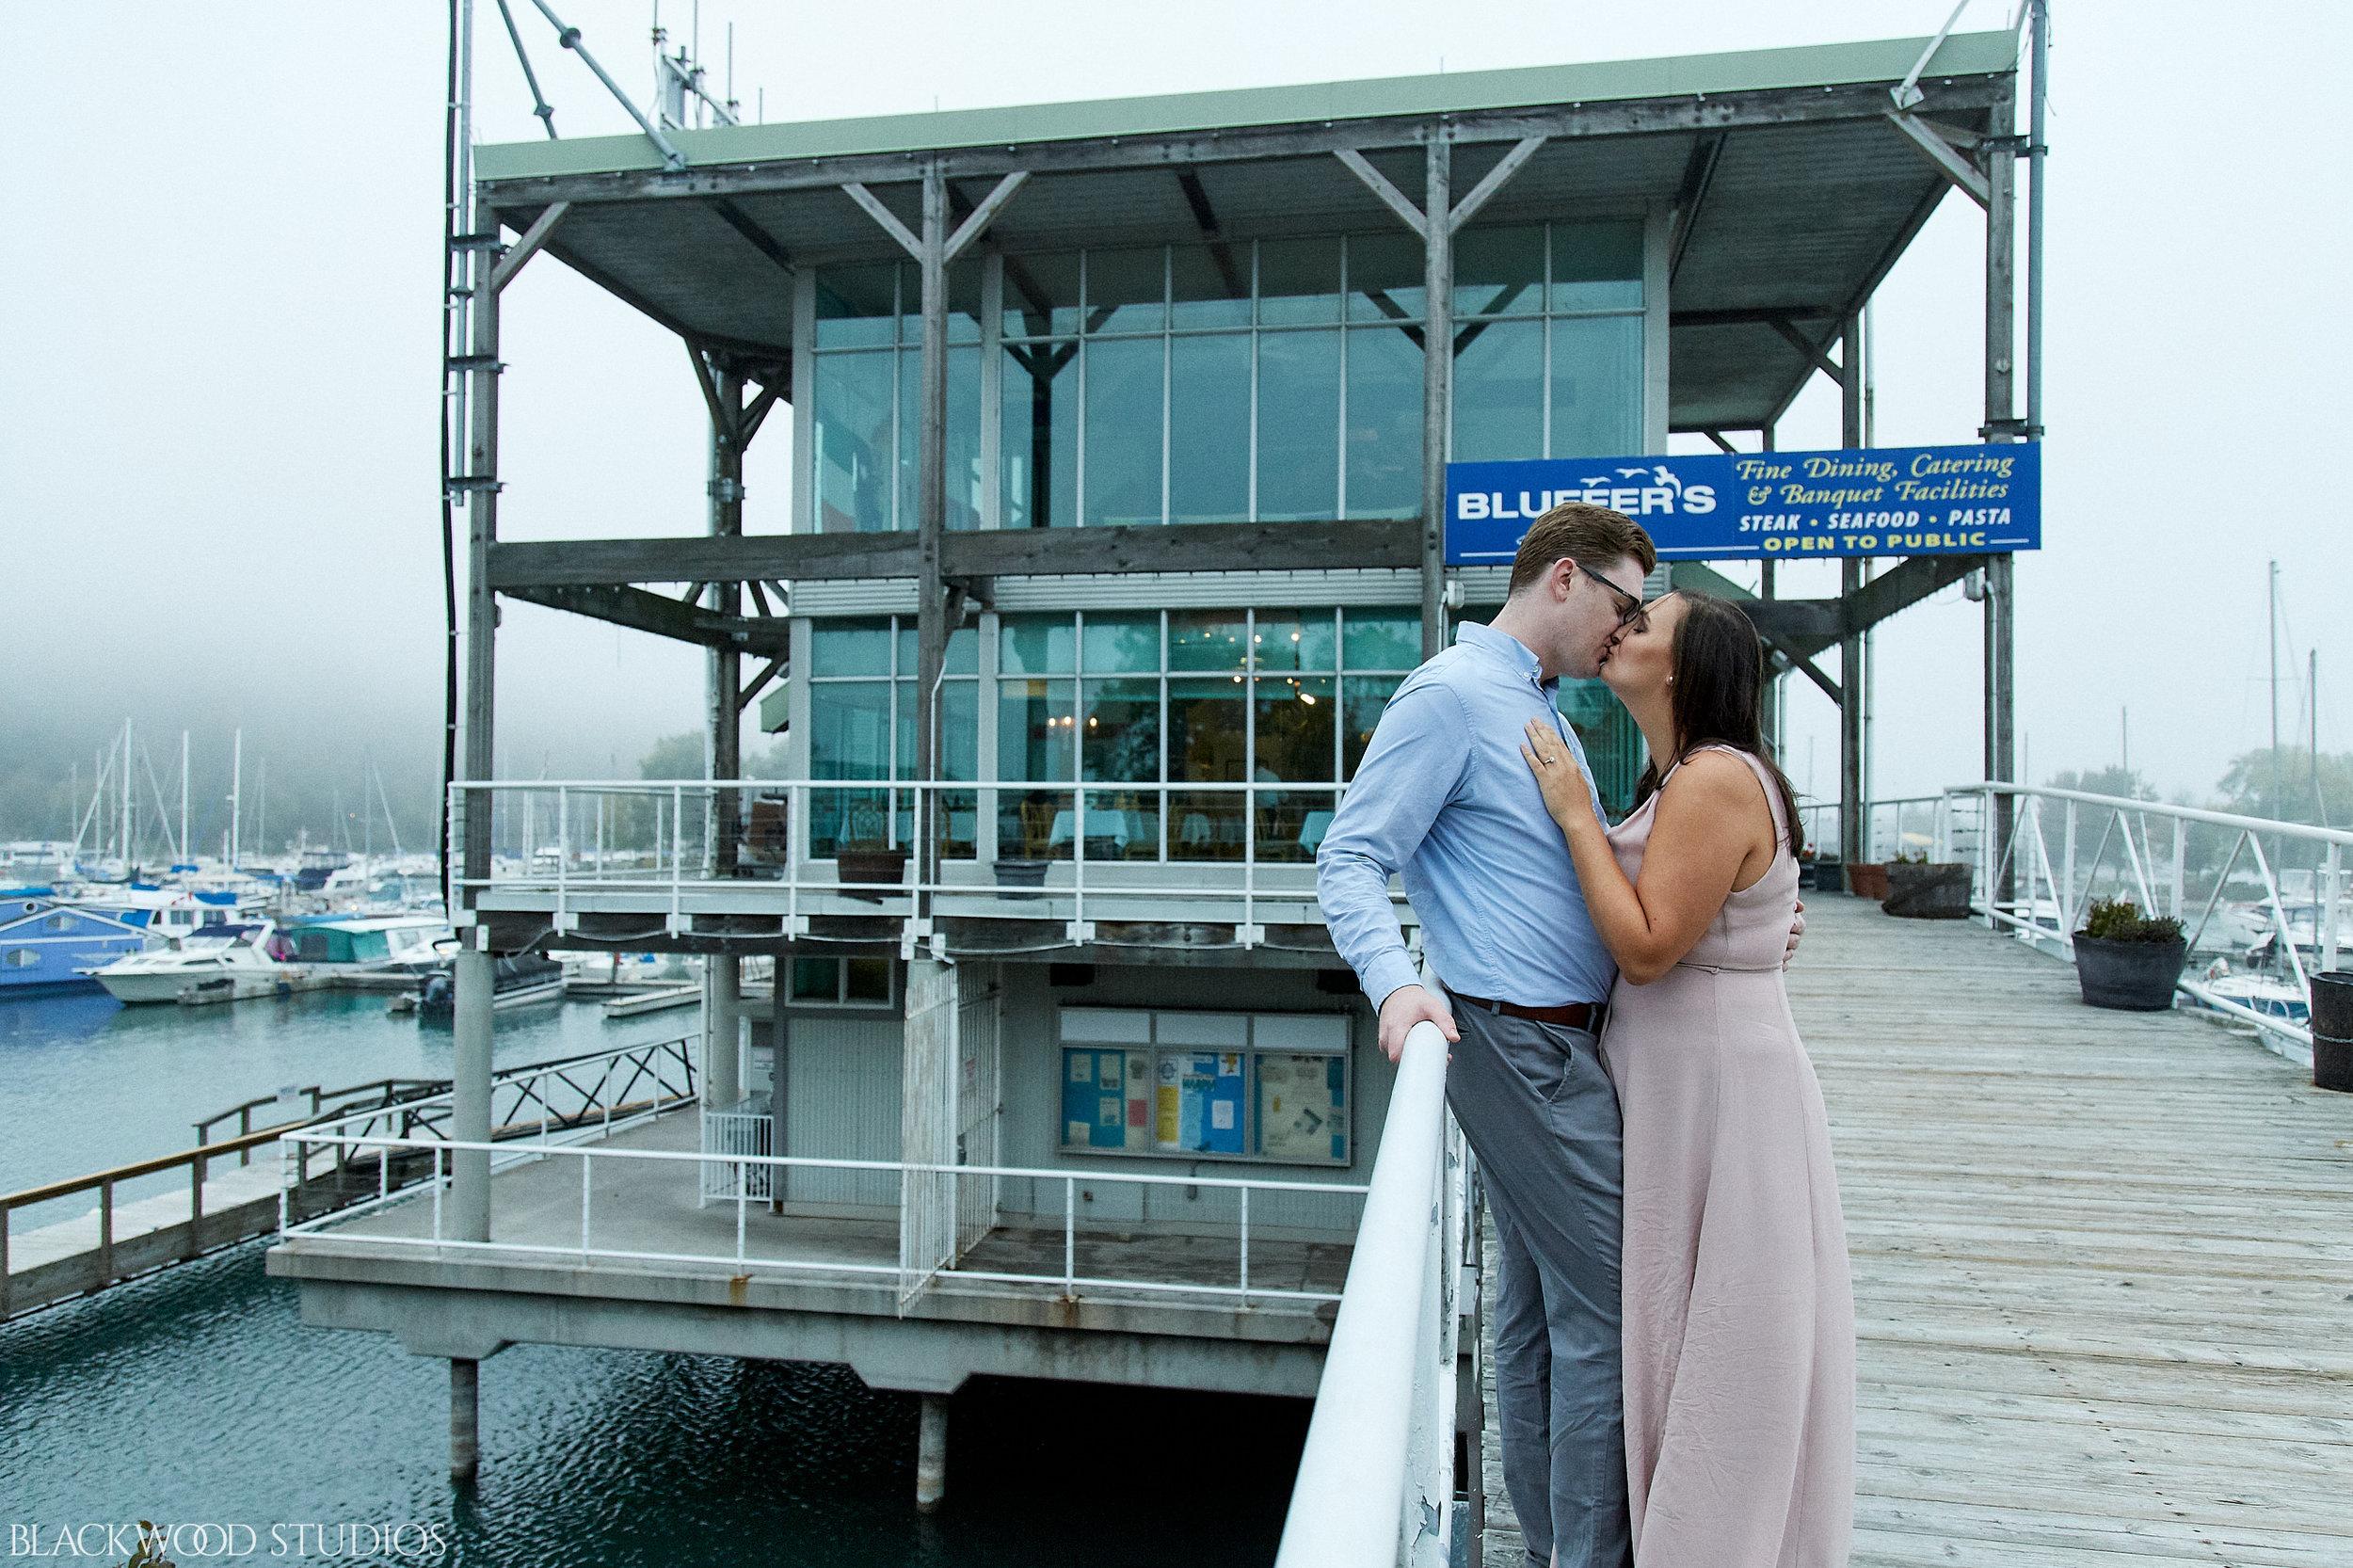 Blackwood-Studios-20181008-18-31-15-Justin-and-Samantha-Engagement-Photography-foggy-Scaraborough-Bluffs-Park-Ontario.jpg